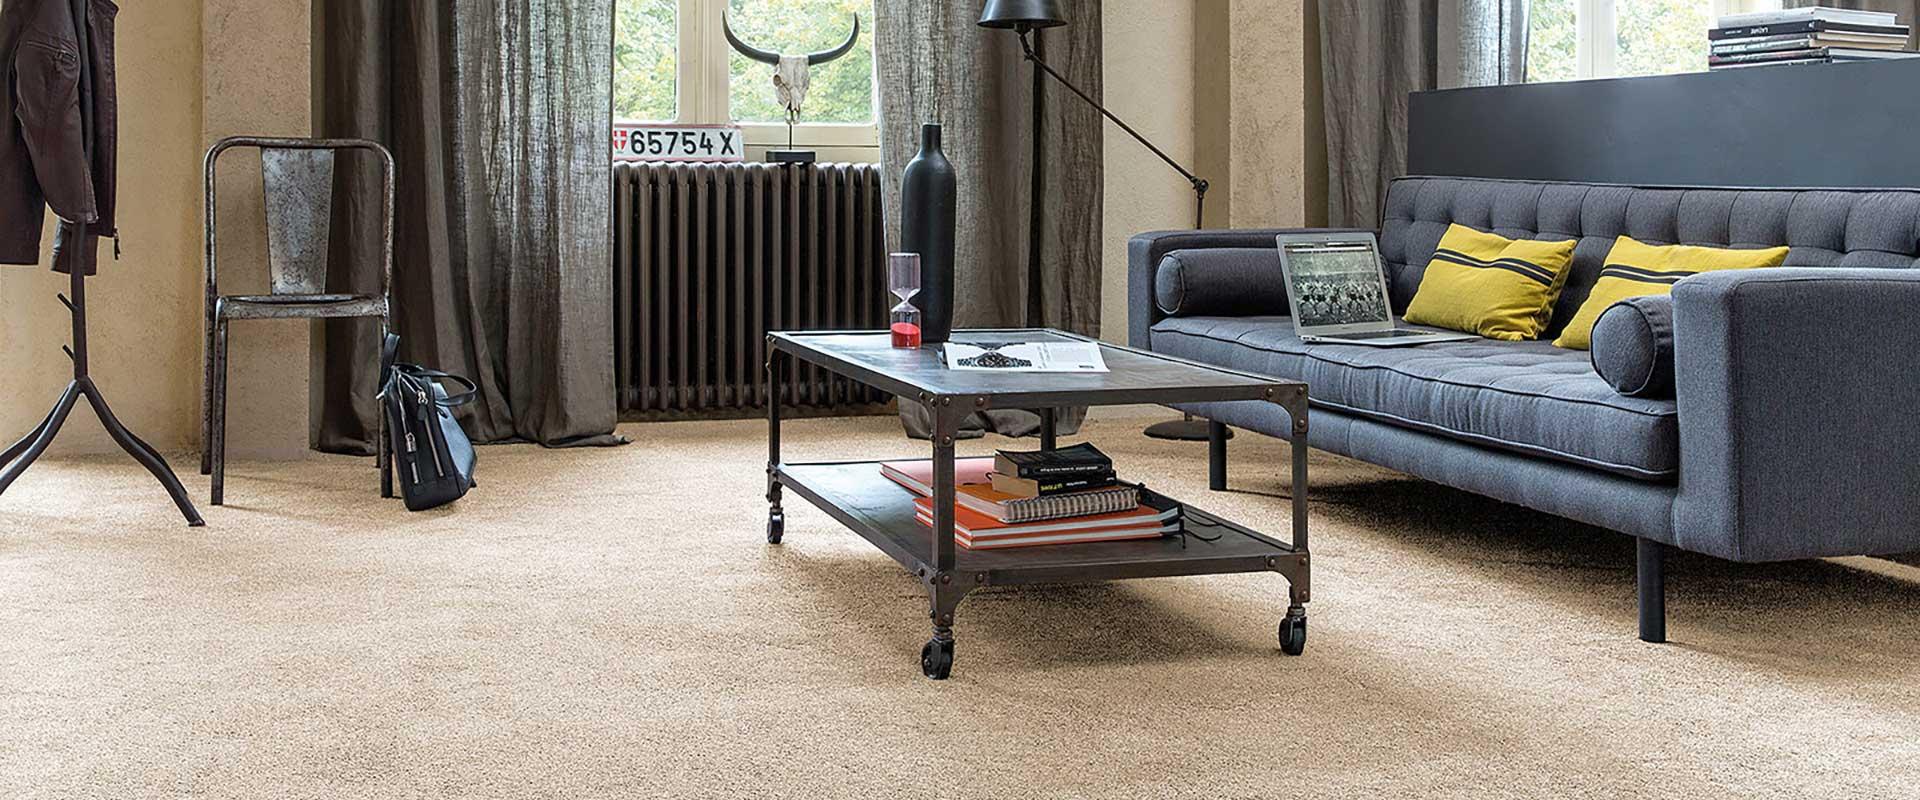 Invictus Carpets Worcester